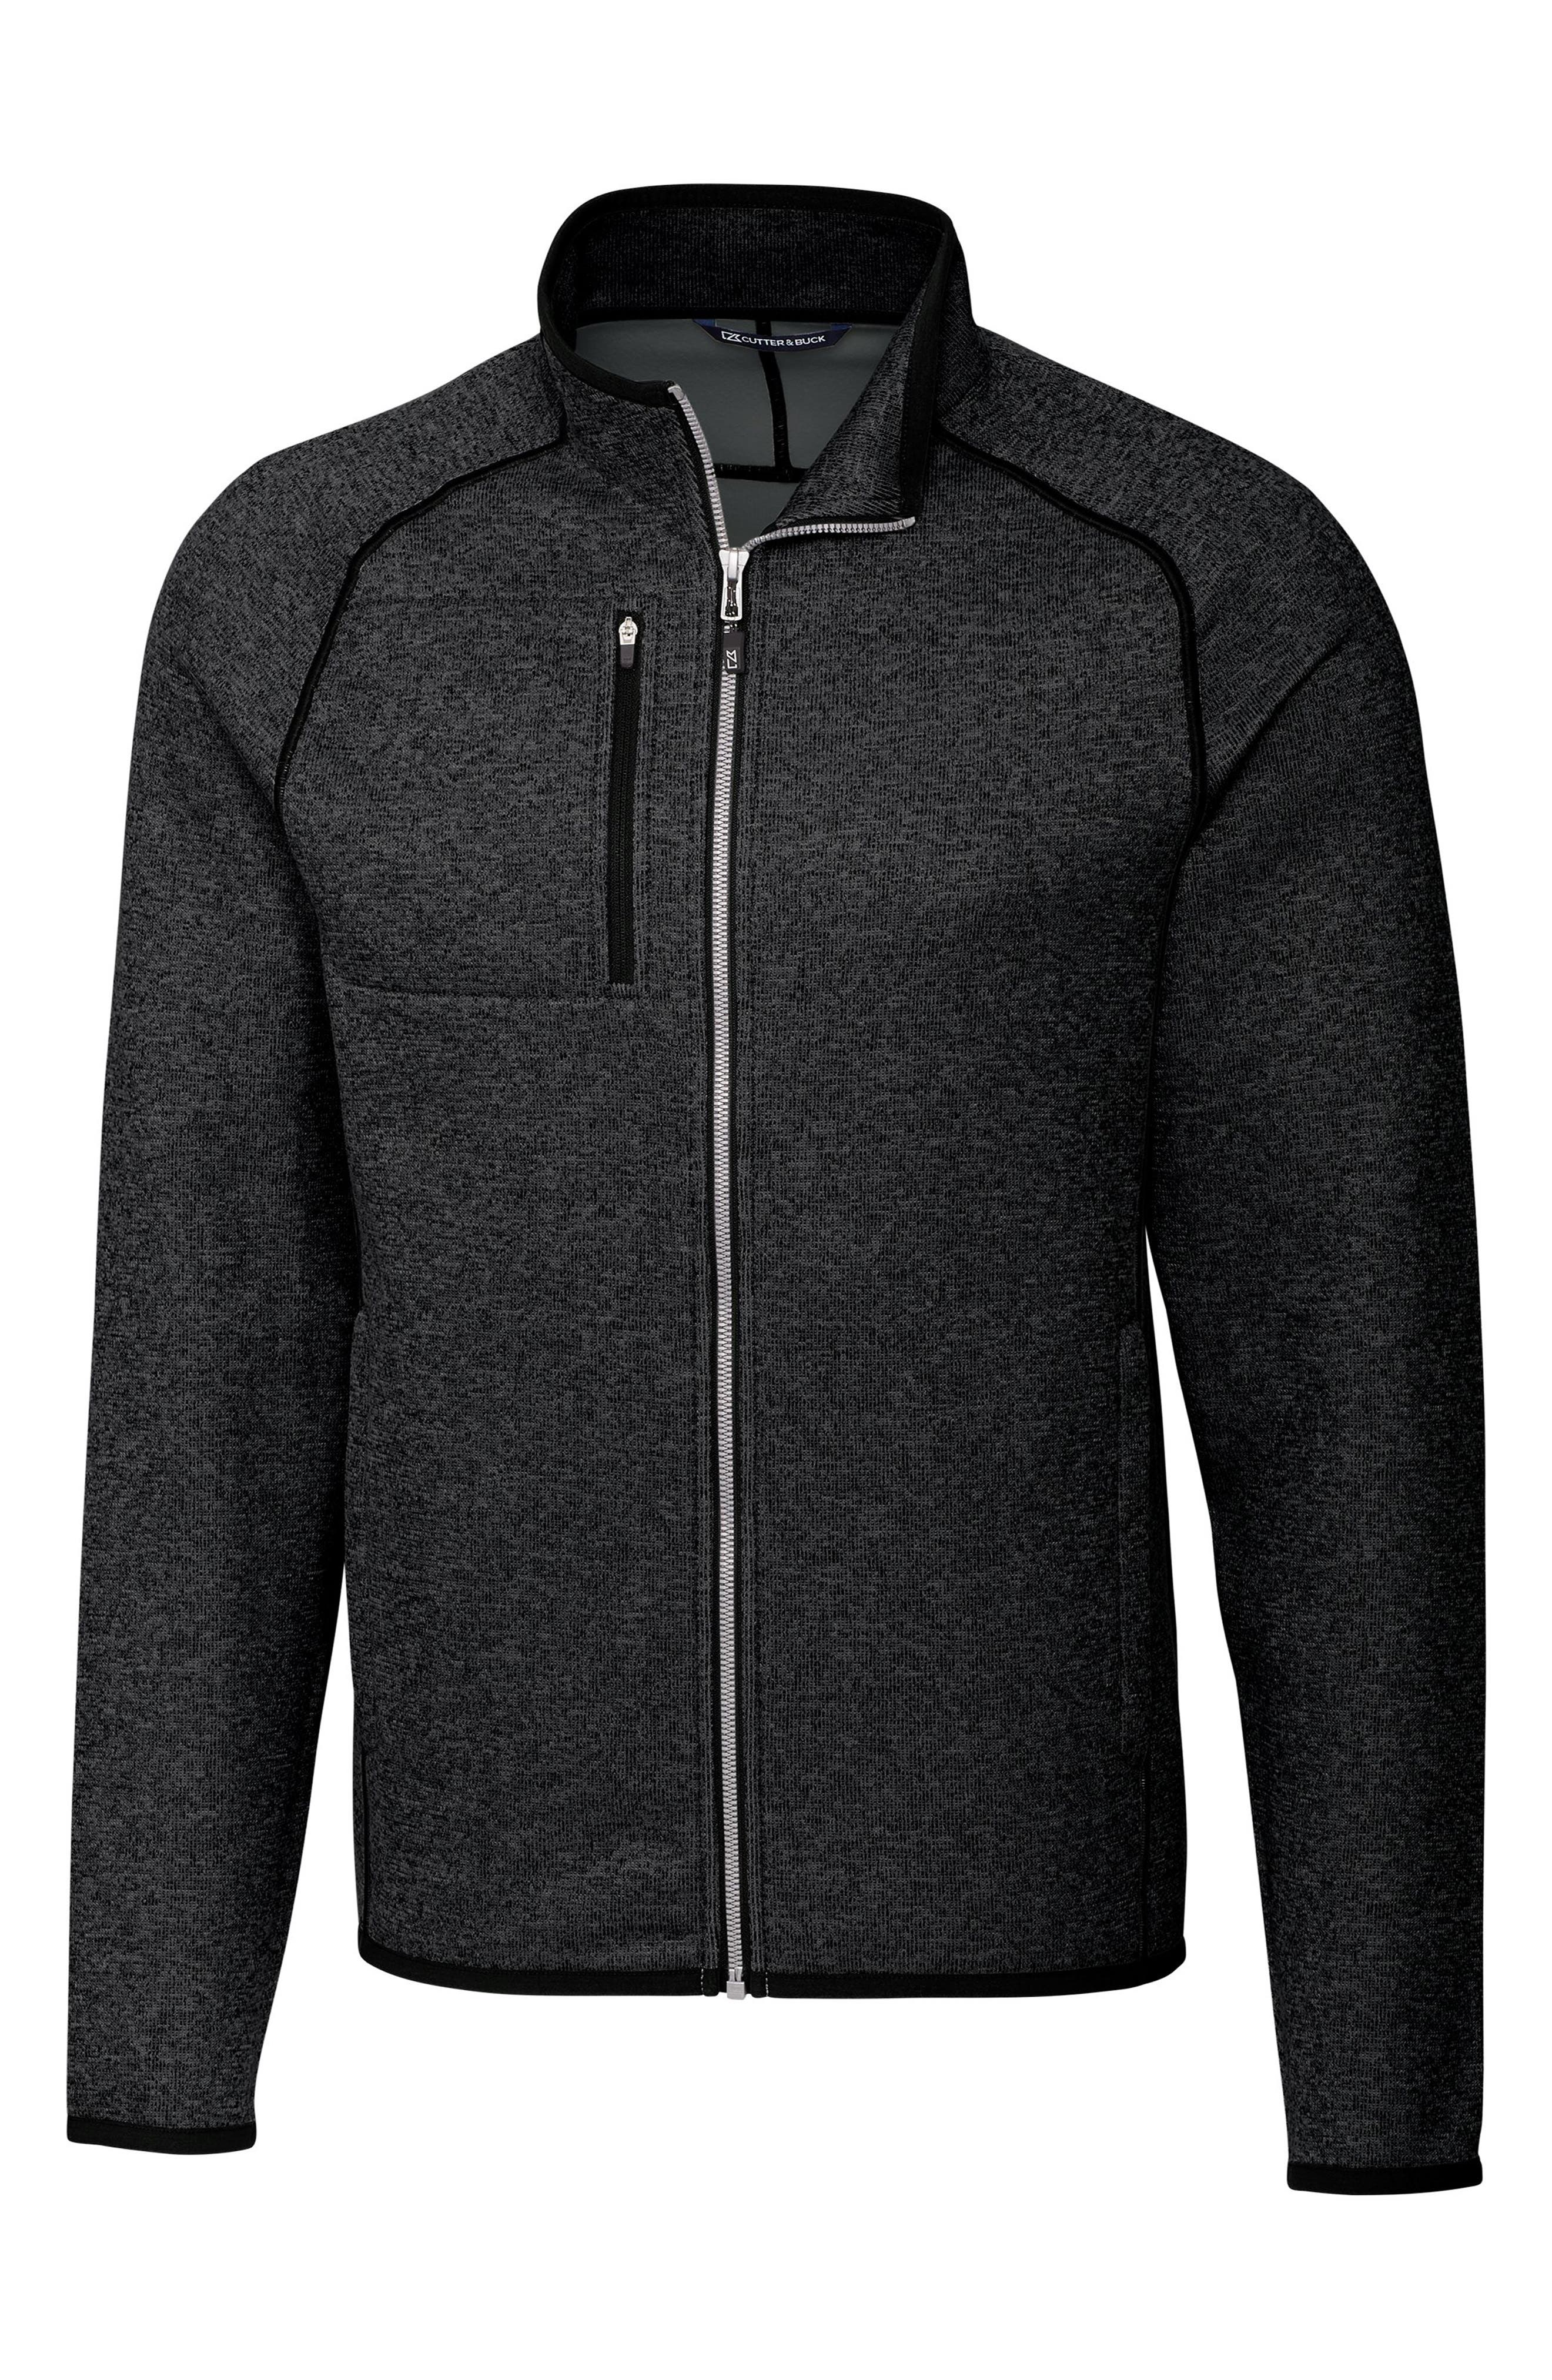 Mainsail Zip Fleece Jacket